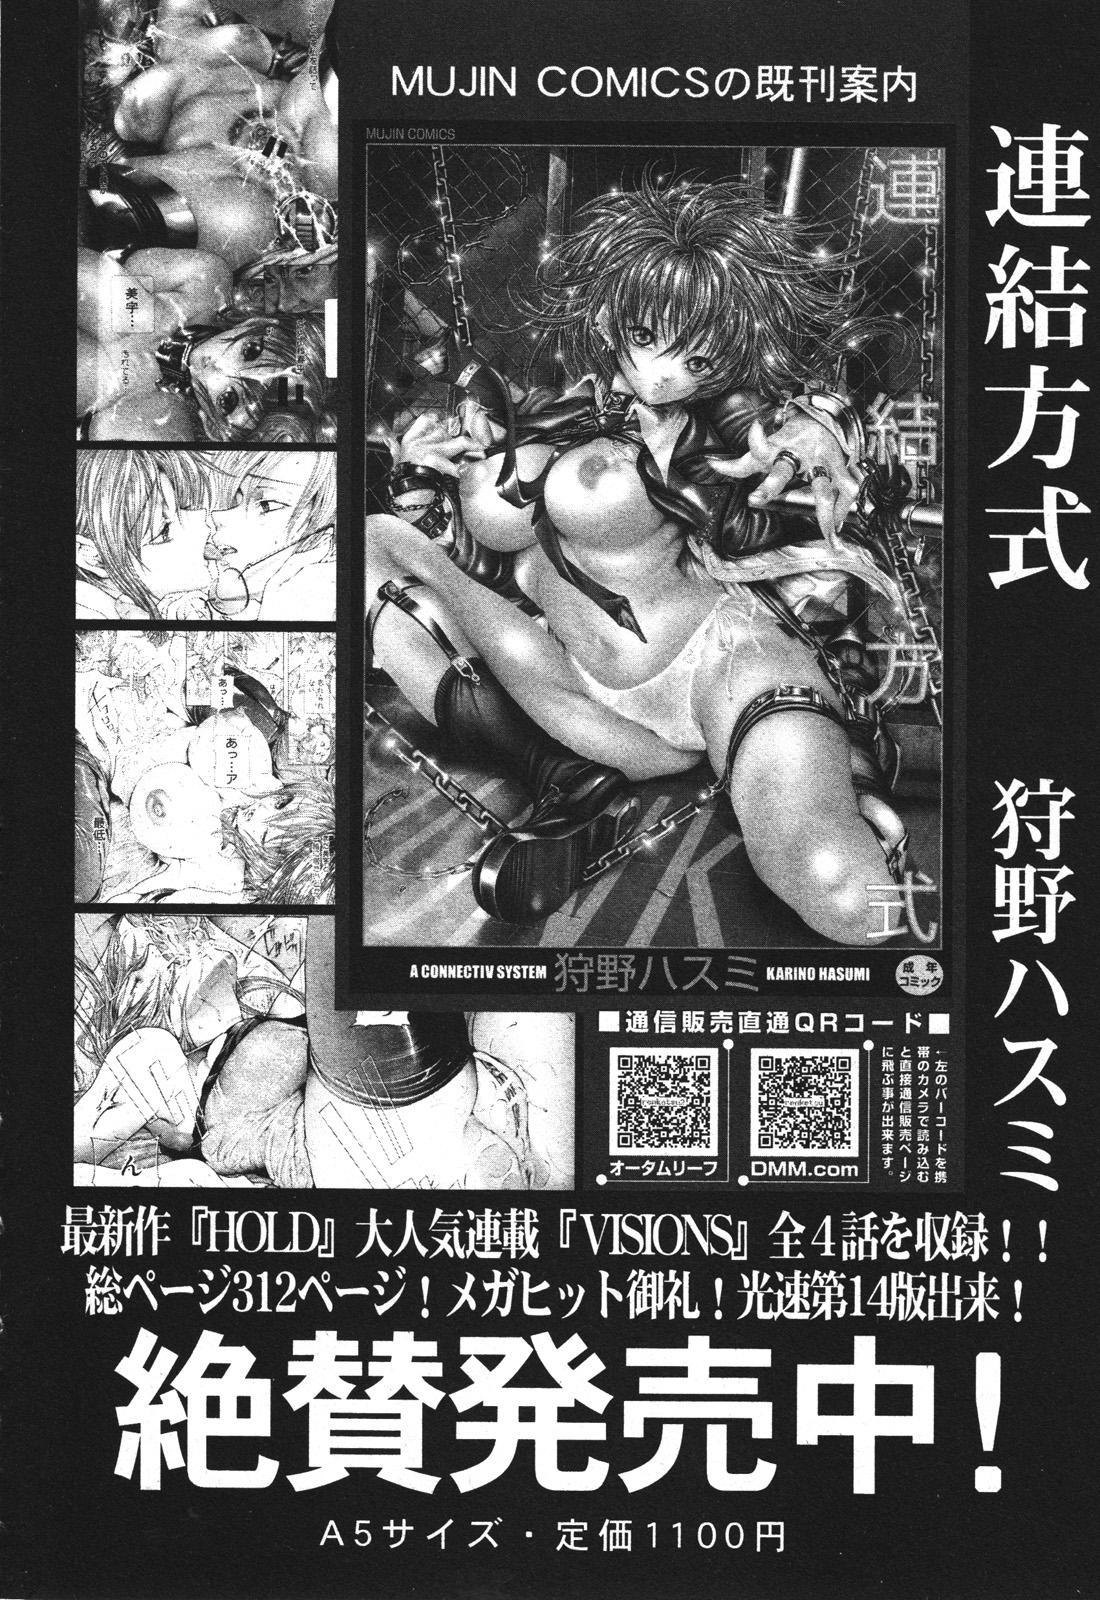 BUSTER COMIC 2010-05 Vol.07 474